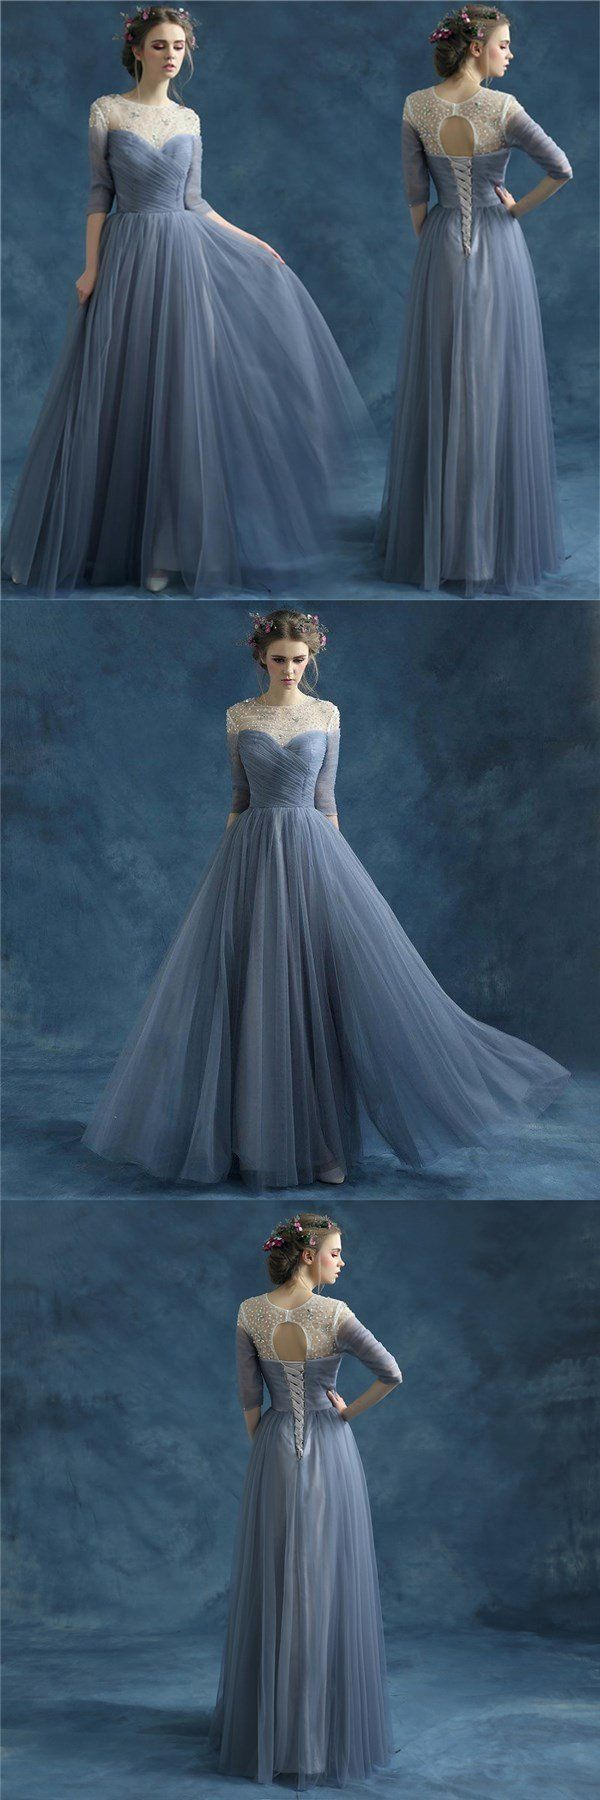 New arrival evening formal bridesmaid dress blue grey wedding dress